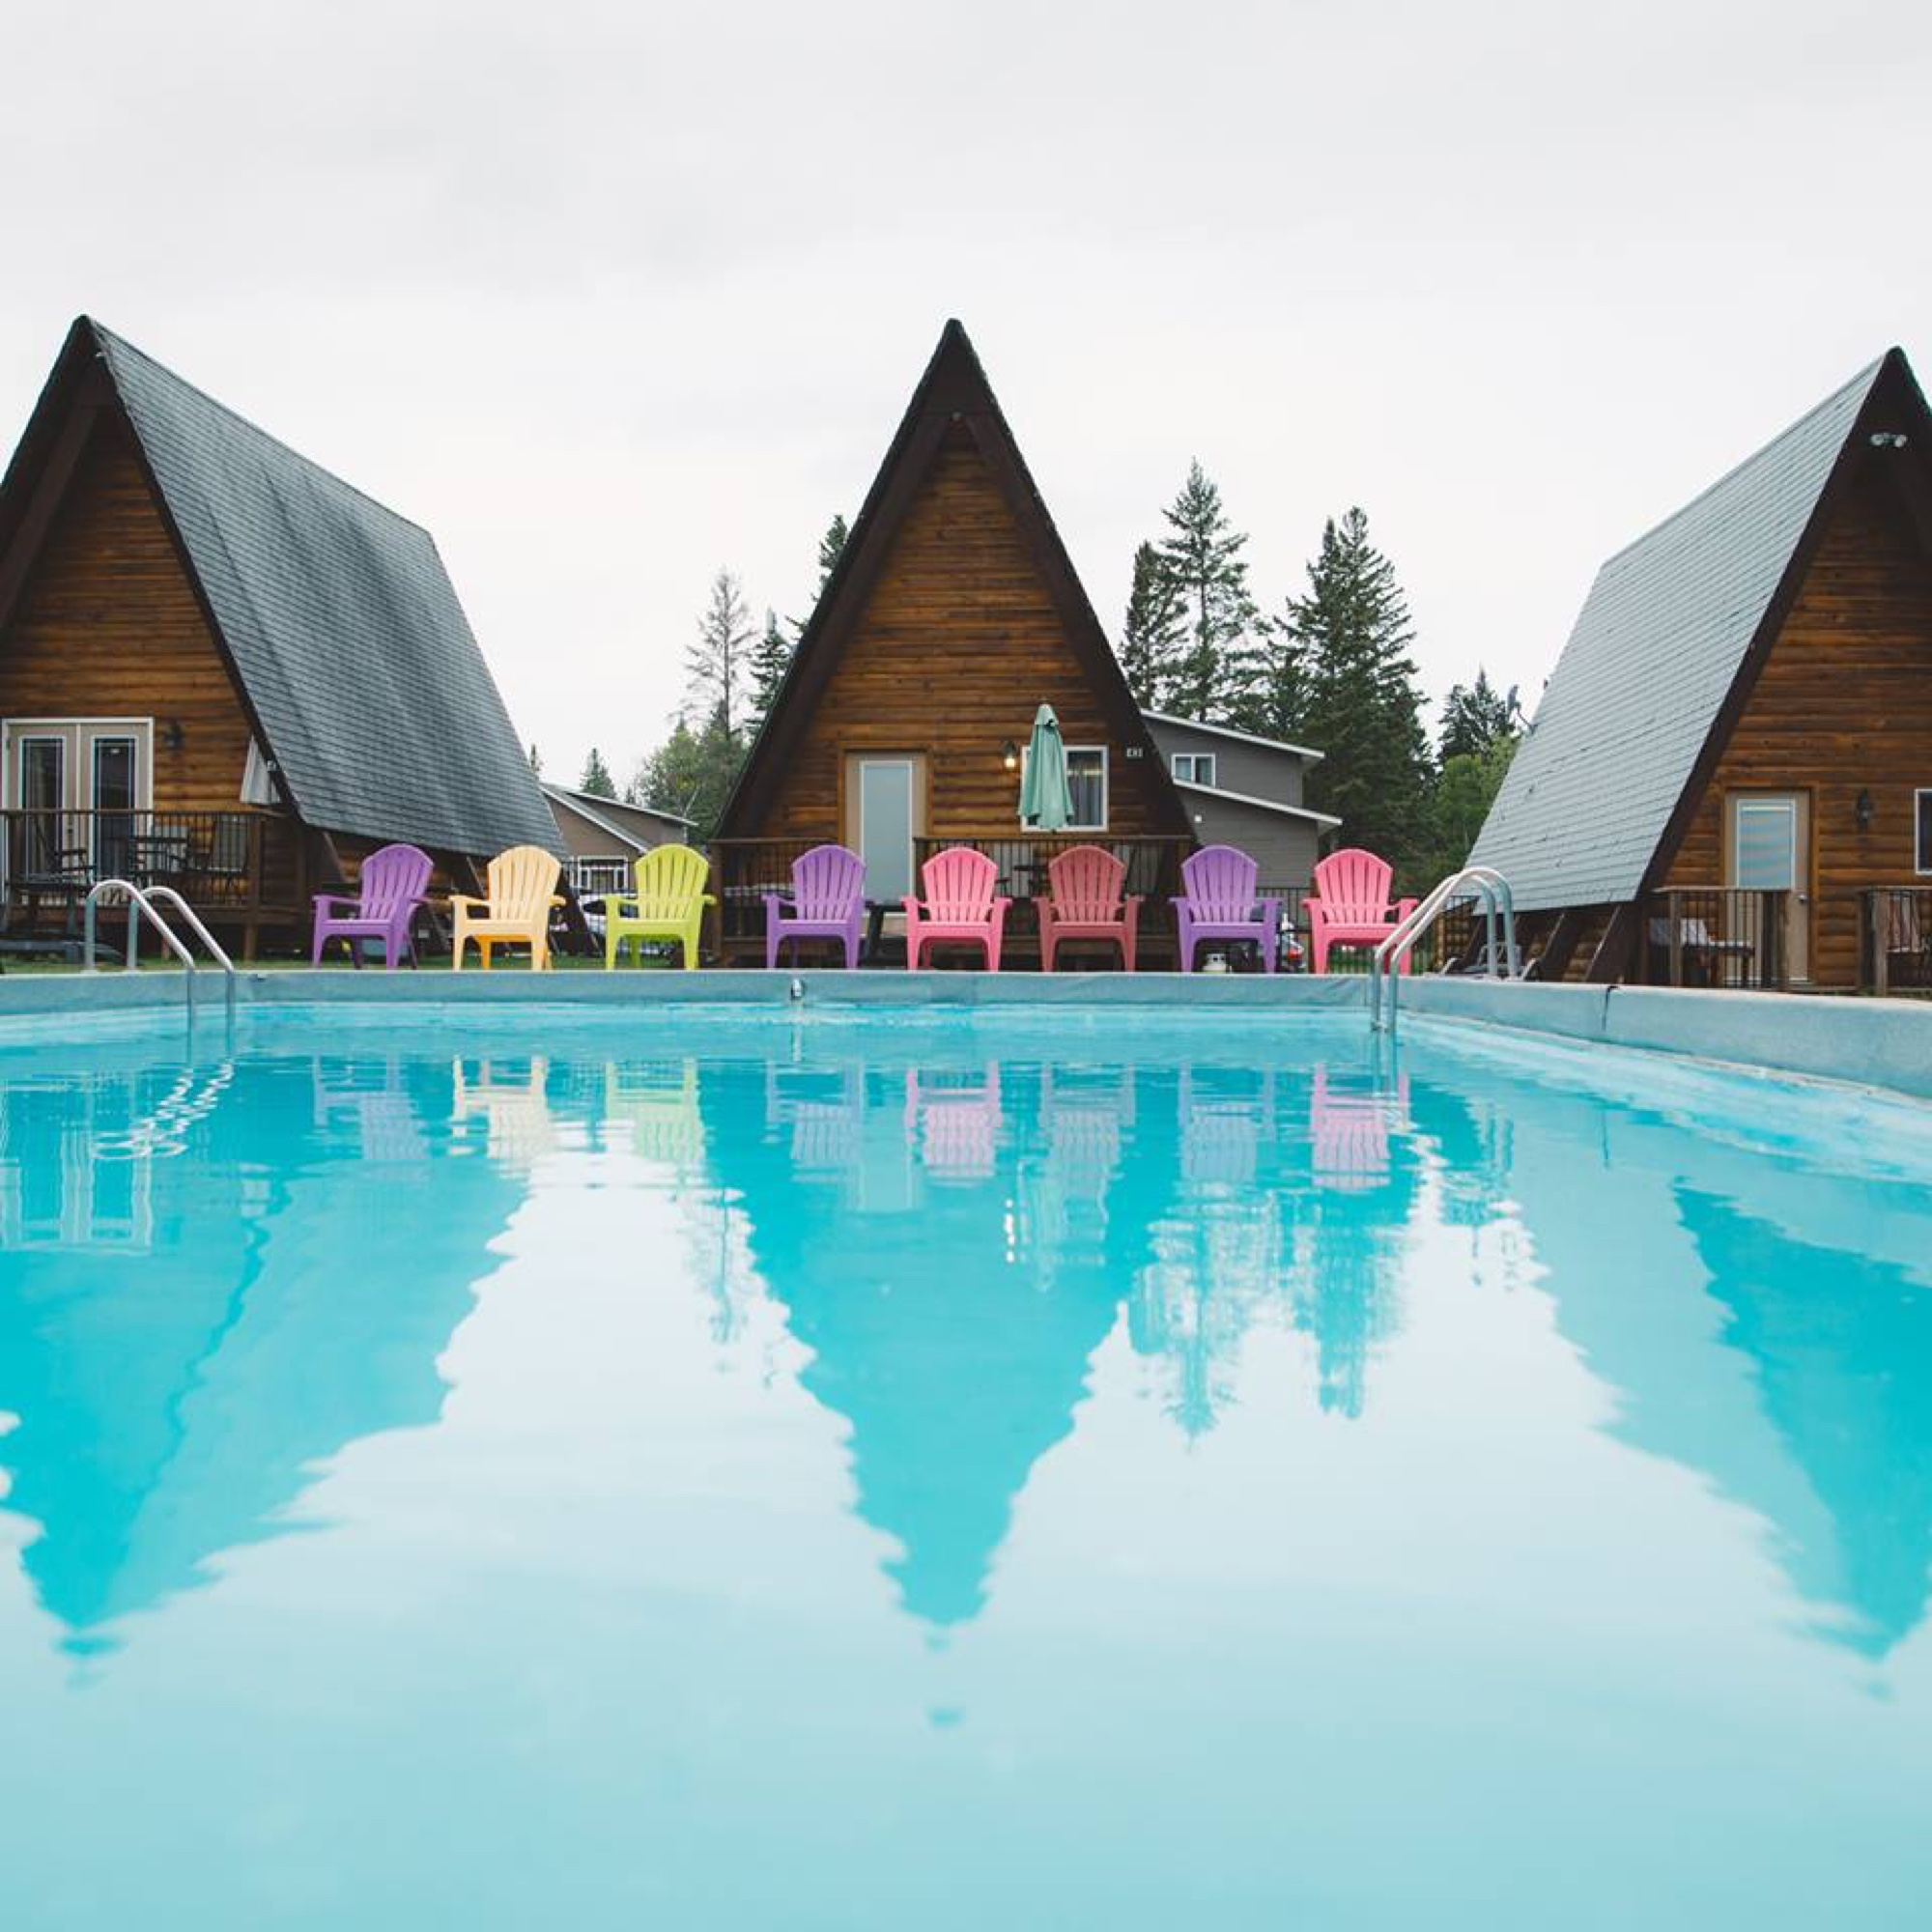 Pool Adirondack photo